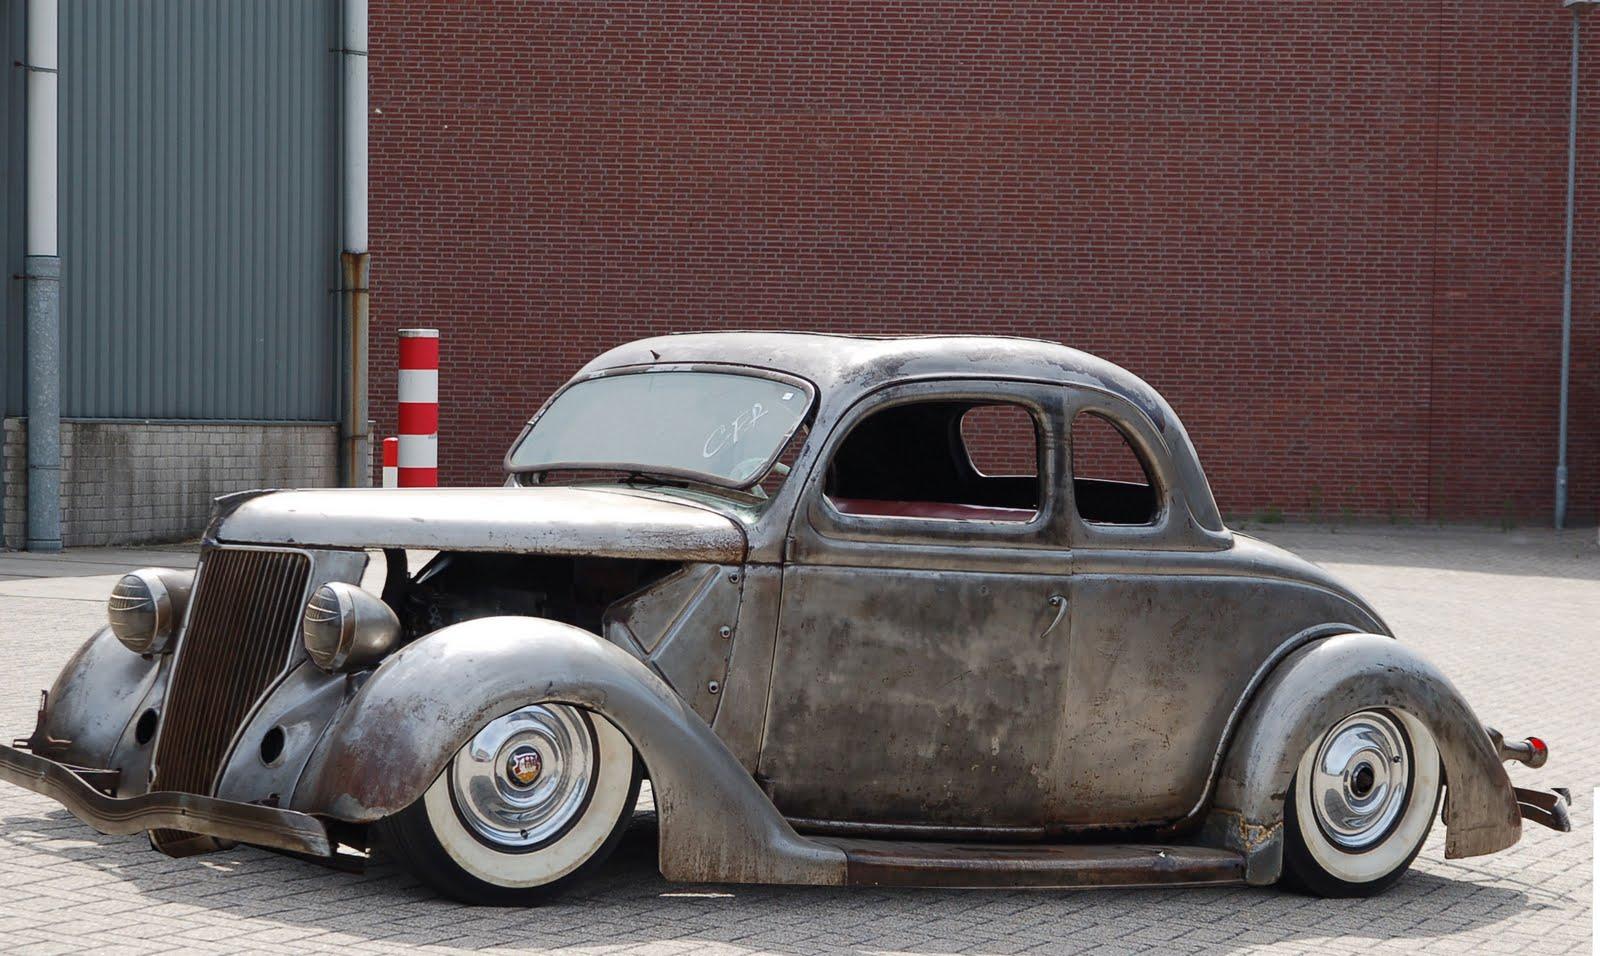 247 AUTOHOLIC: 1936 Ford Coupe